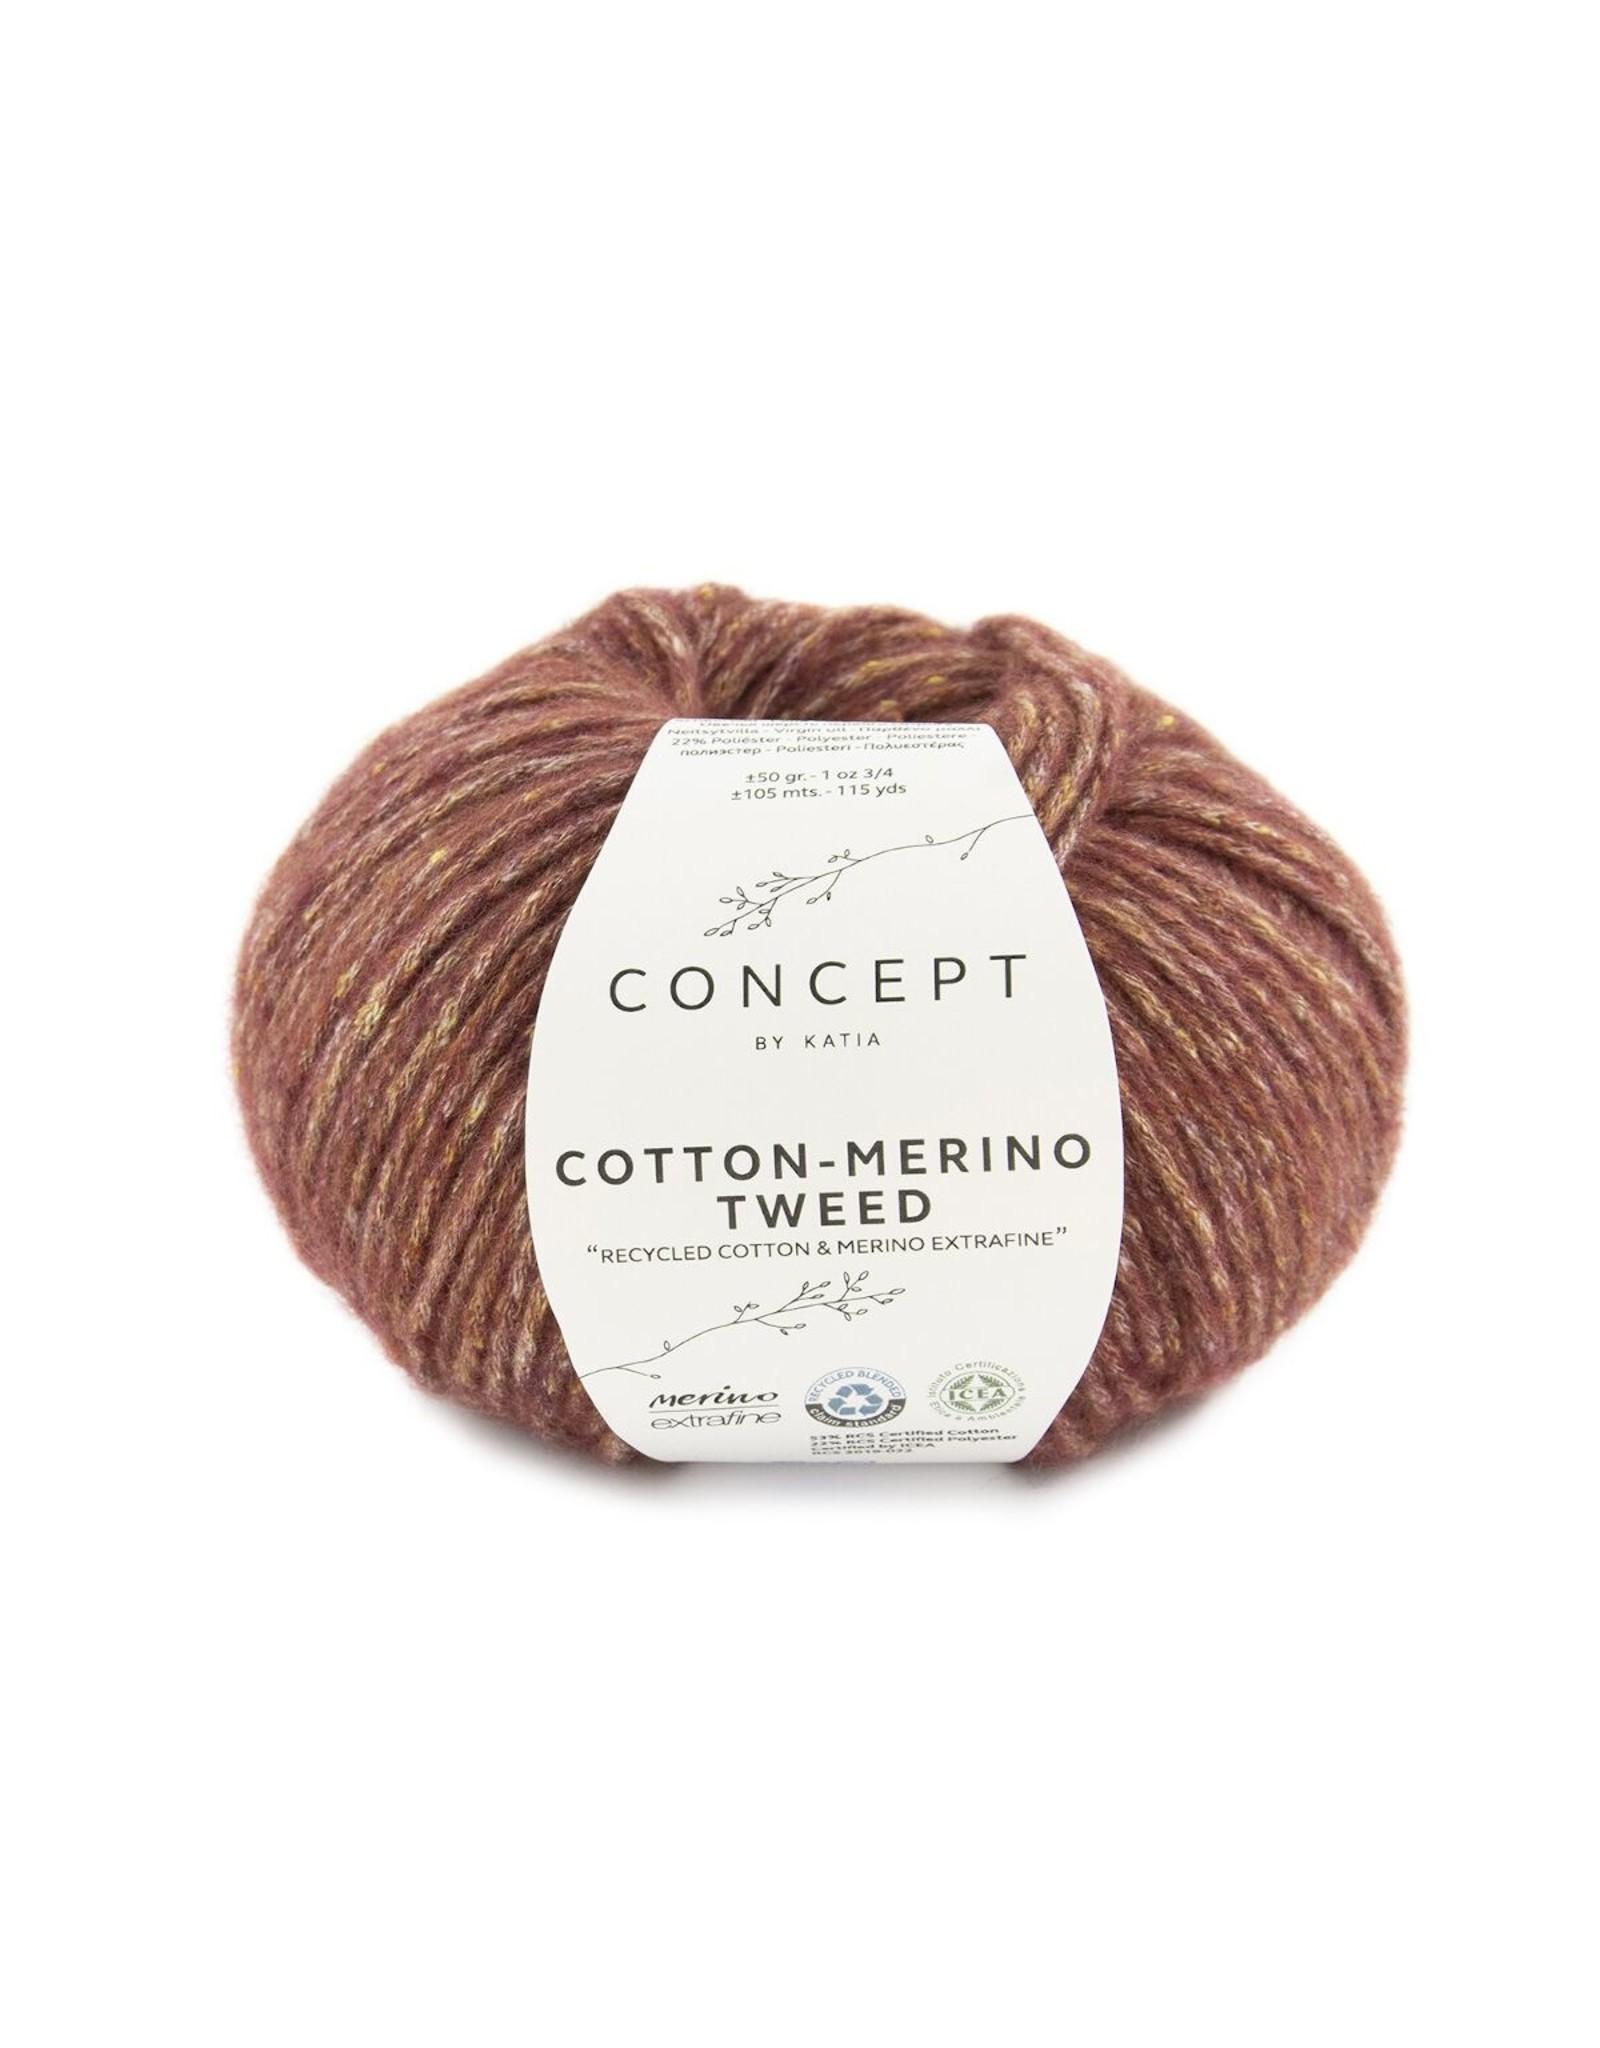 Katia Katia Concept Cotton Merino Tweed